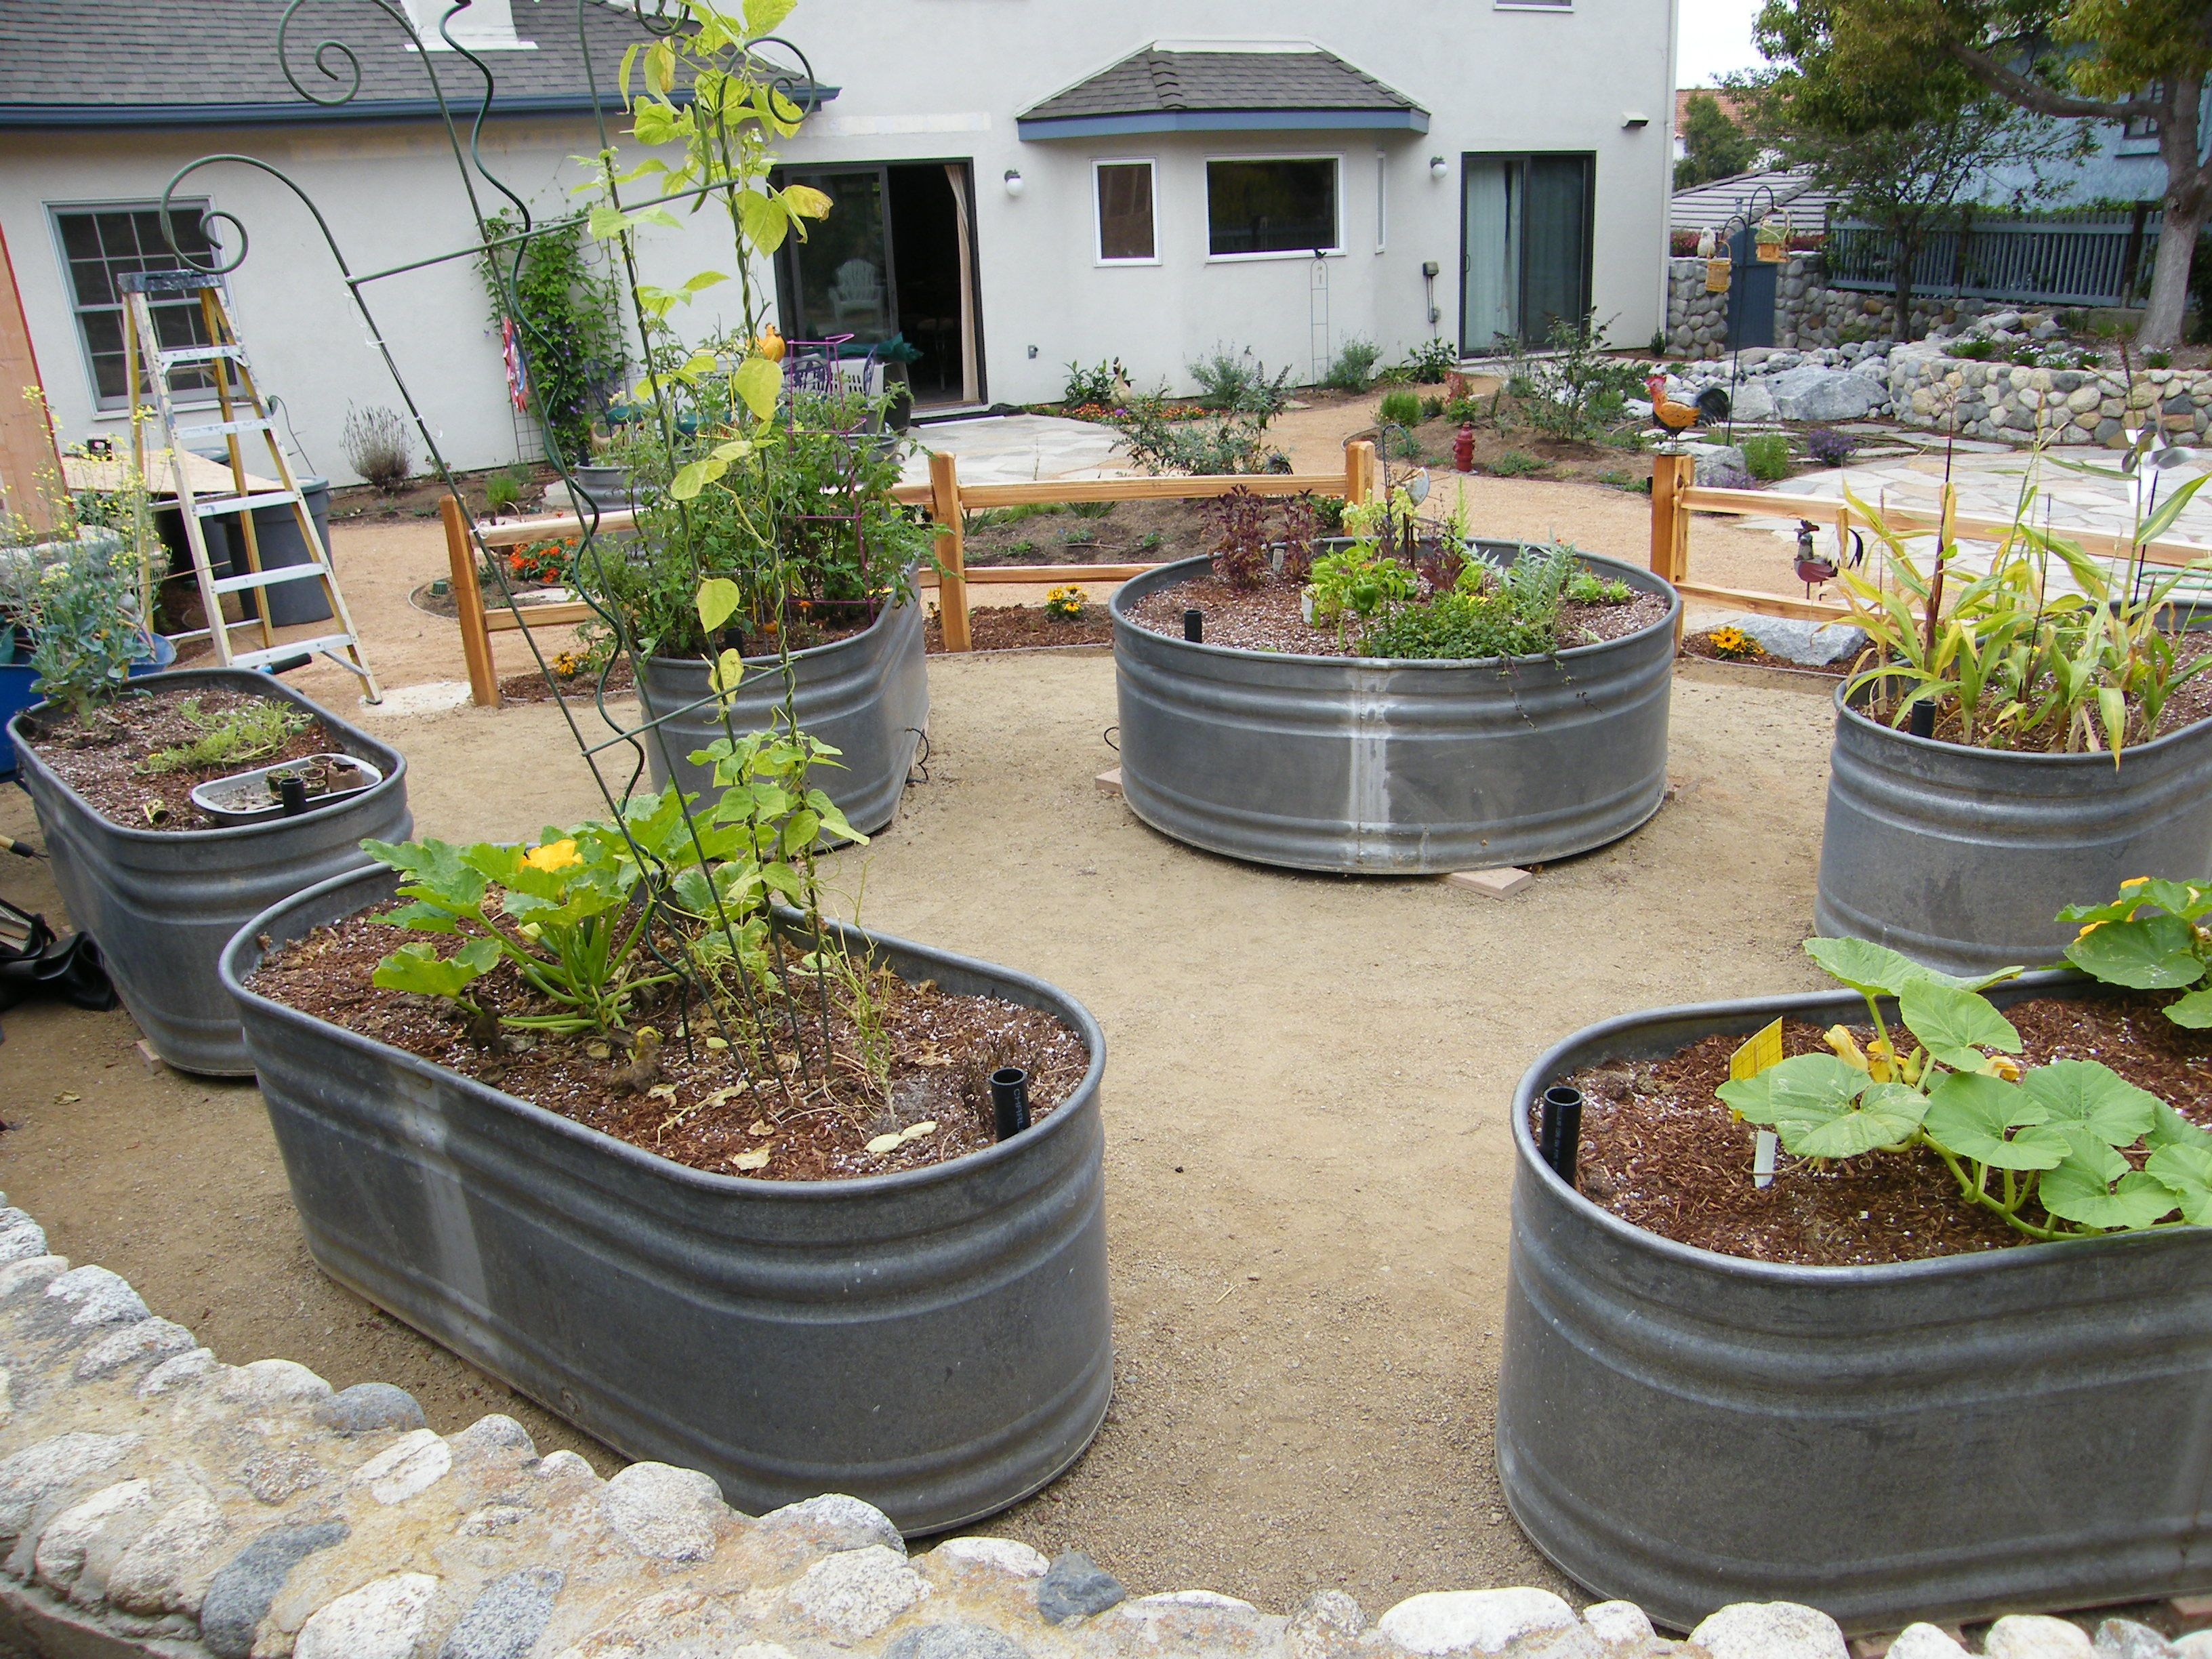 Stock tanks used as raised vegetable beds gardening for Backyard planter ideas